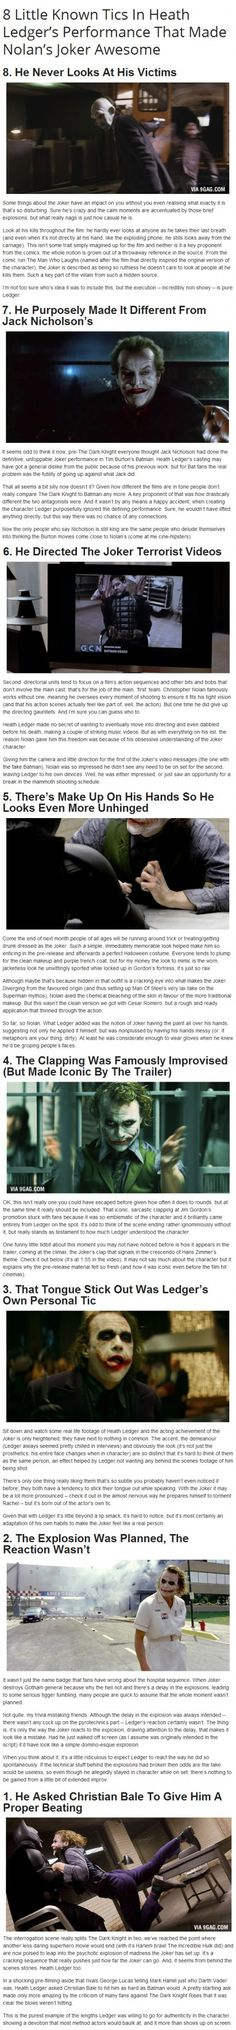 We need more actors like Heath Ledger.